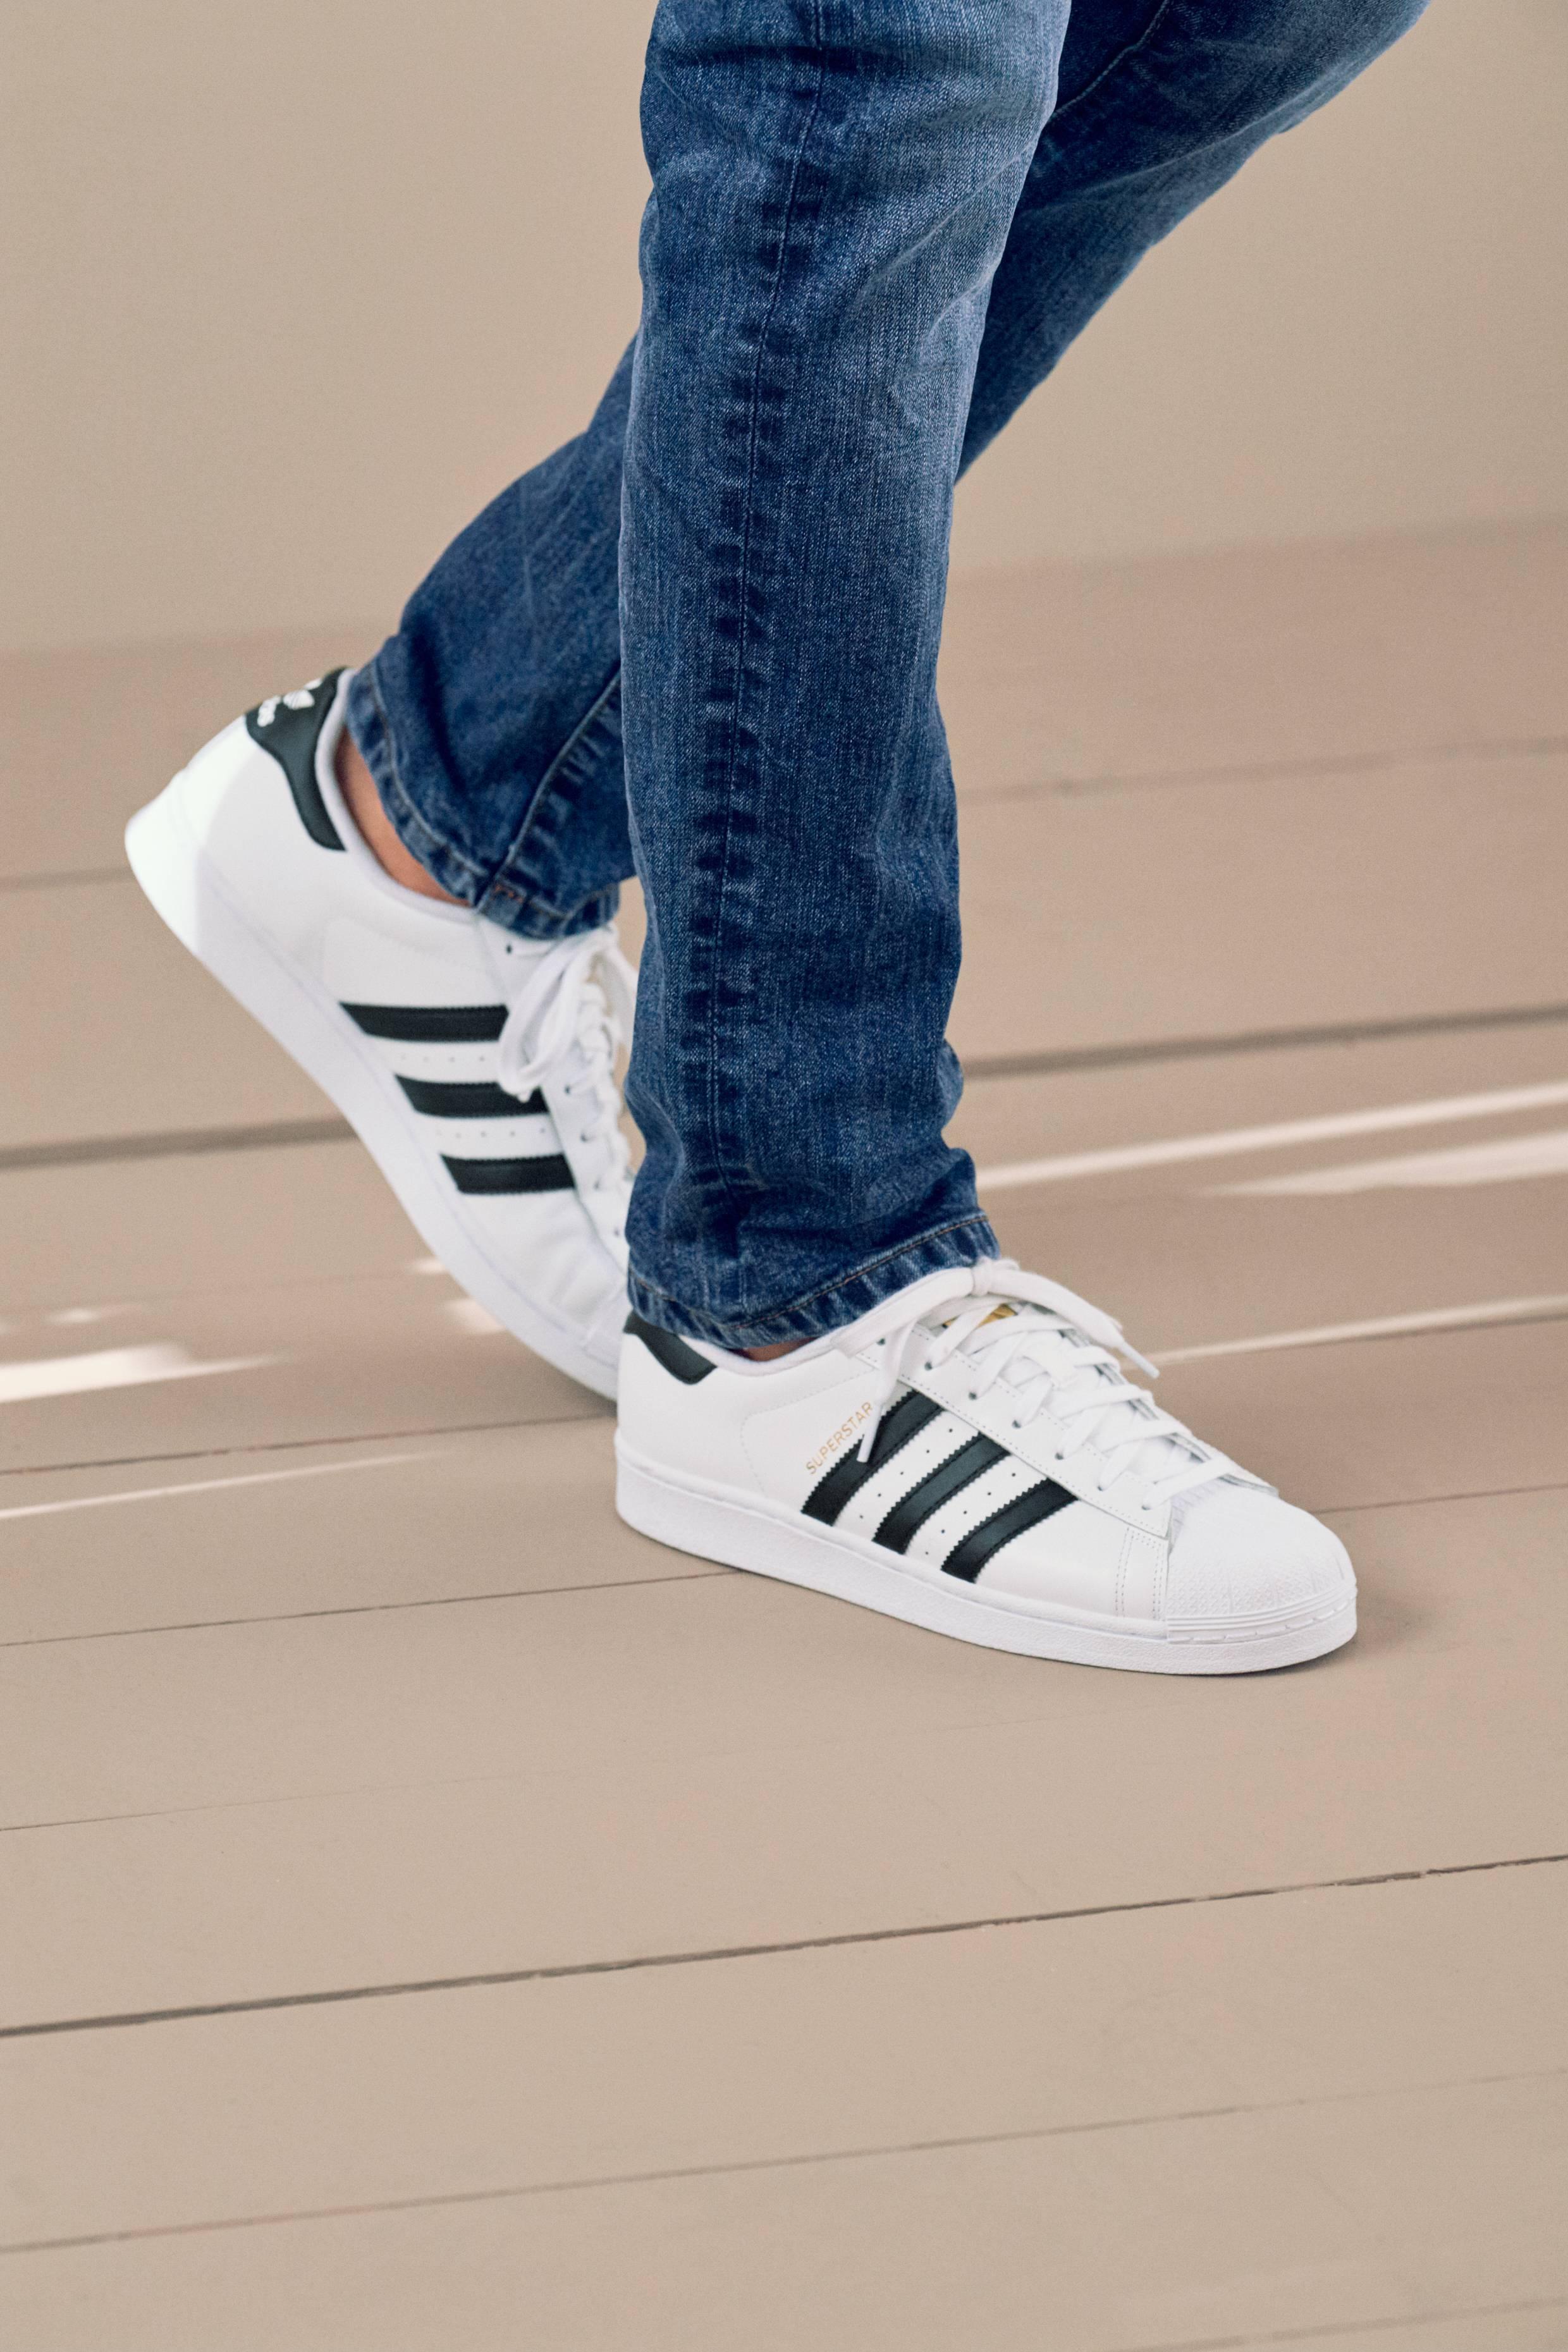 innovative design 0c89b 231f7 sneakers superstar